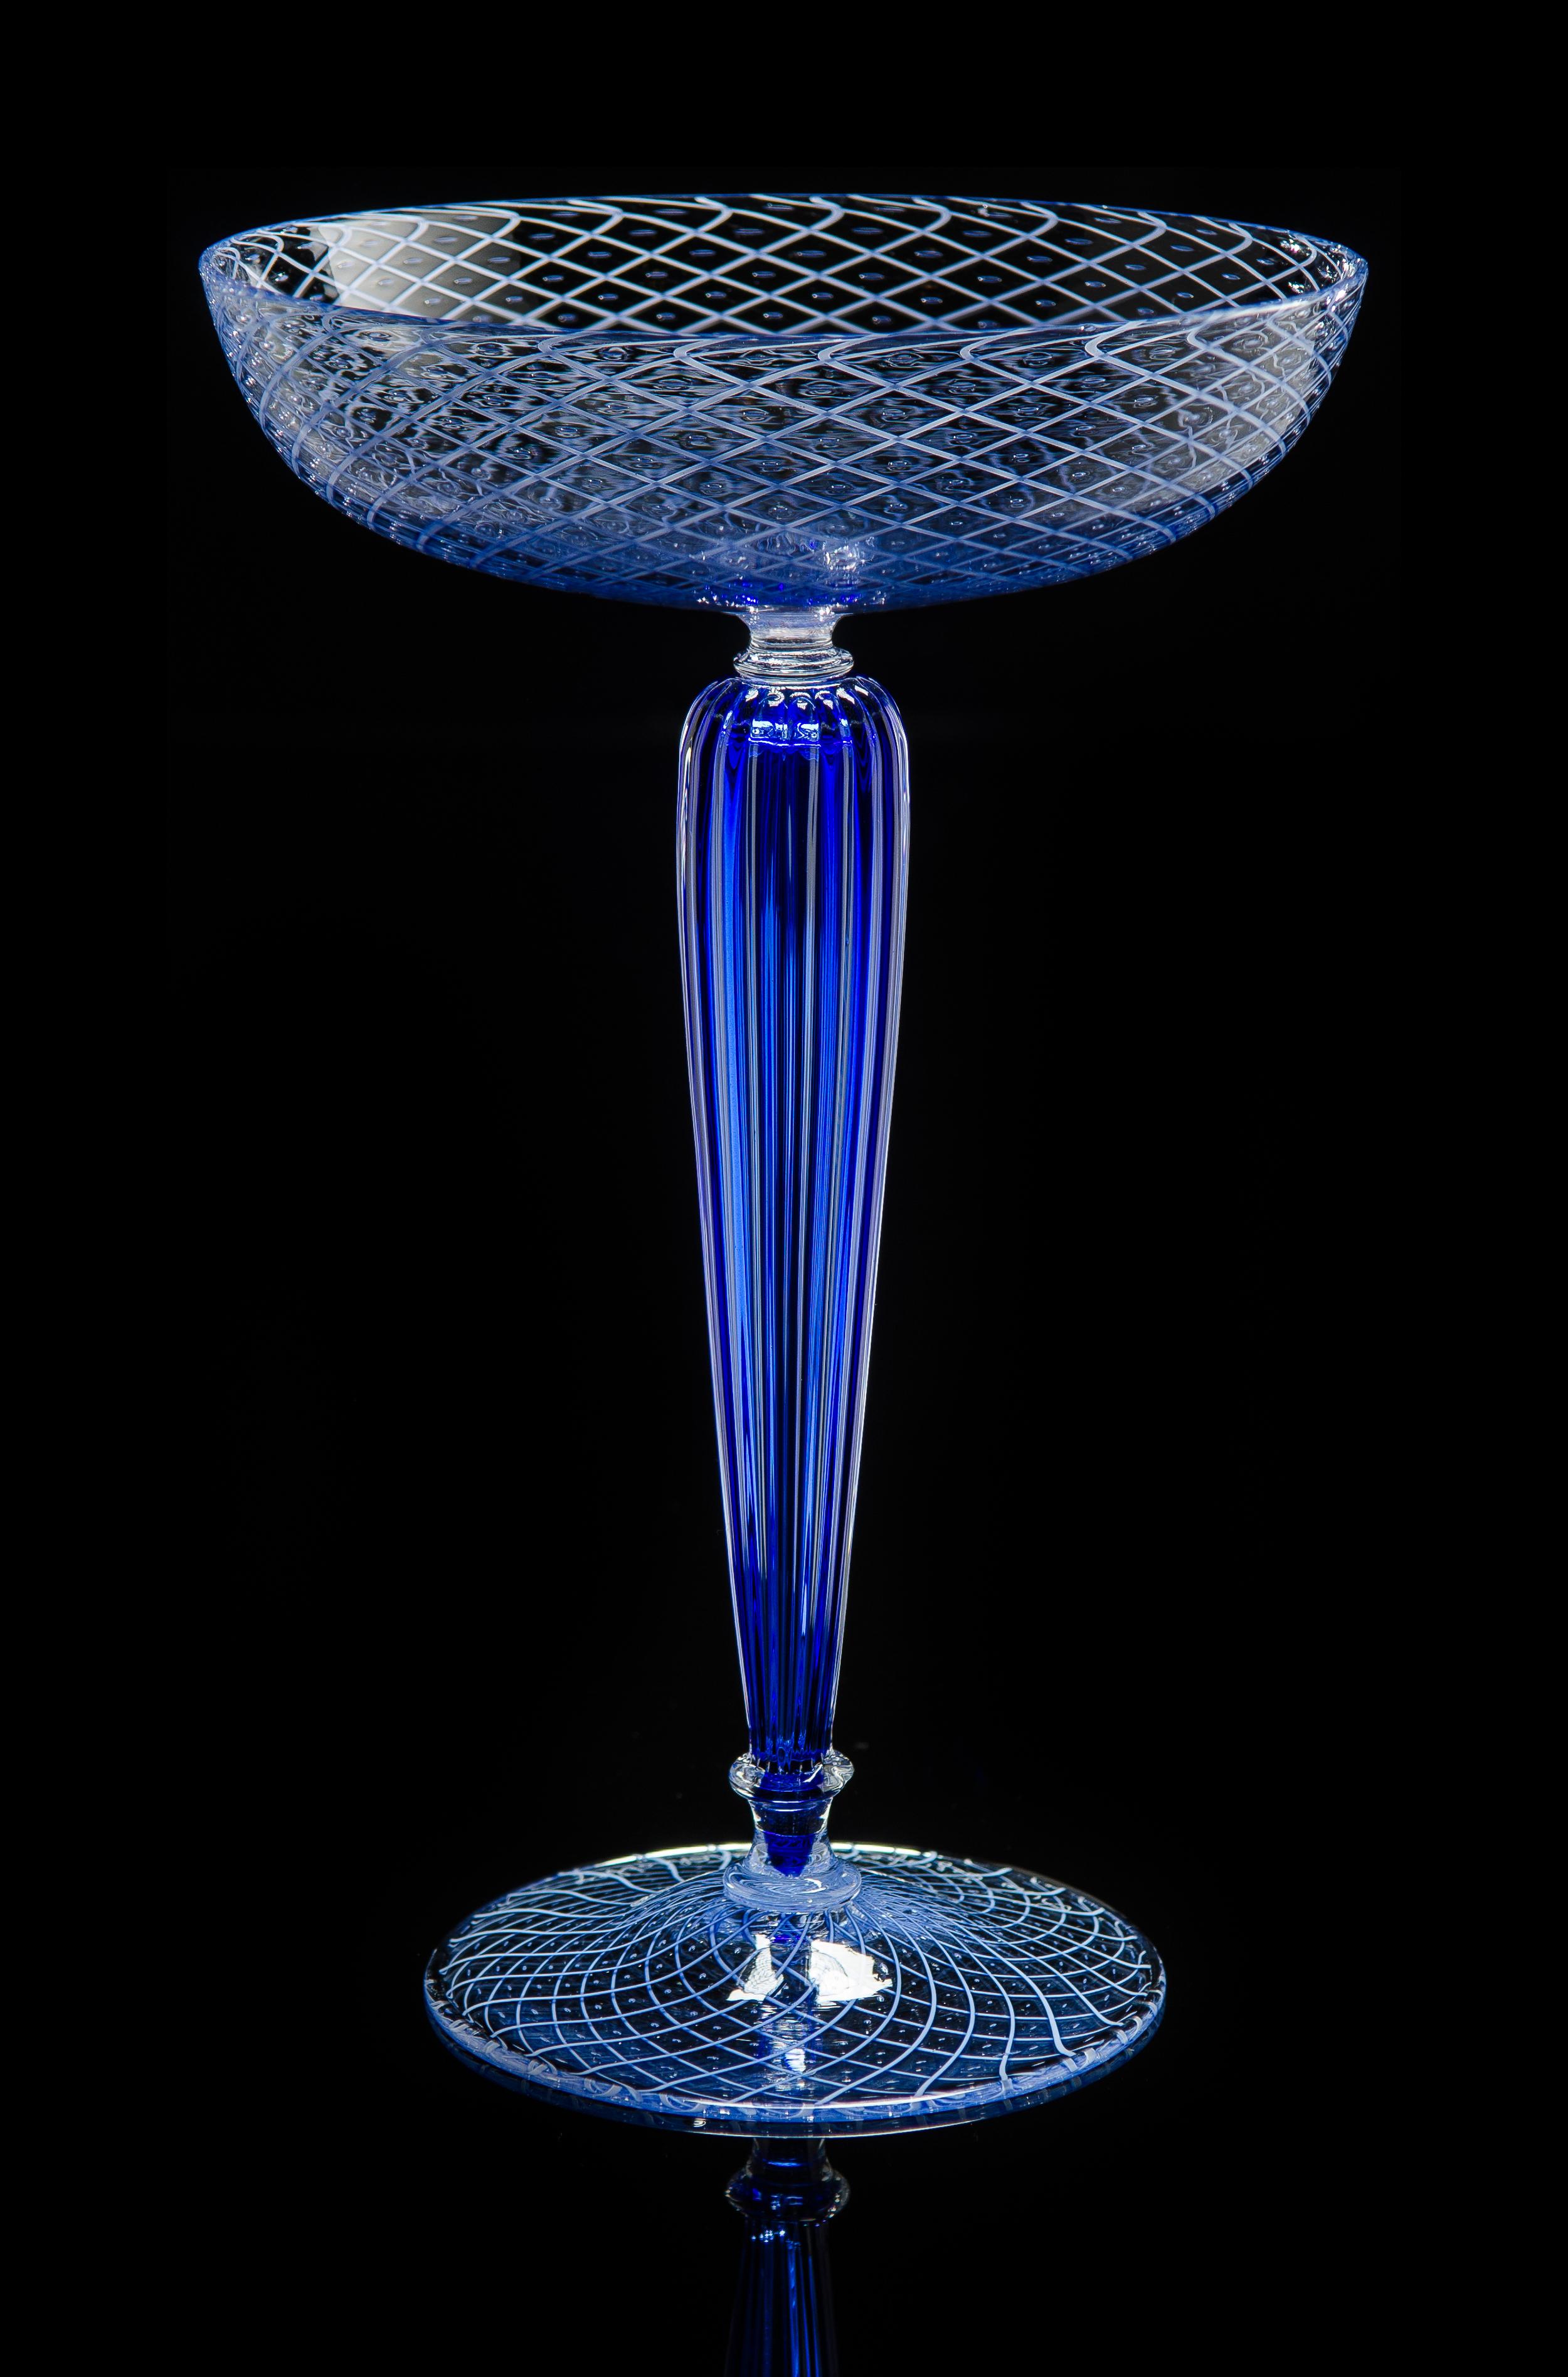 Lino Tagliapietra, Goblet (1991-1994, glass, 8 1/8 x 5 1/4 x 5 1/4 inches), LT.2